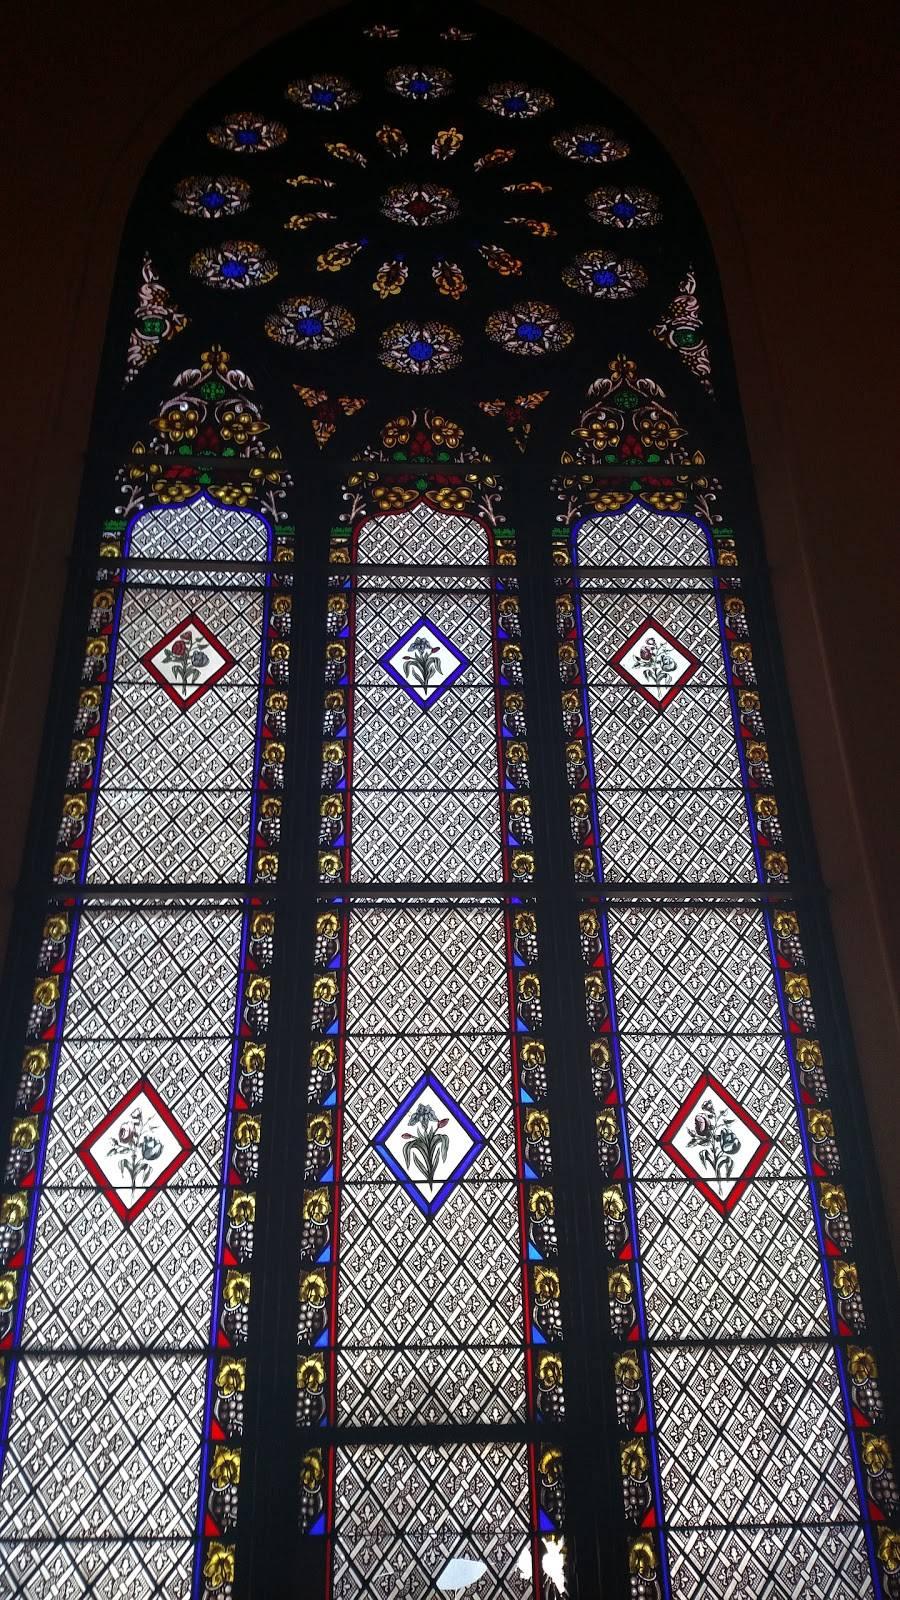 Calvary Presbyterian Church - church  | Photo 10 of 10 | Address: 628 N 10th St, Milwaukee, WI 53233, USA | Phone: (414) 271-8782